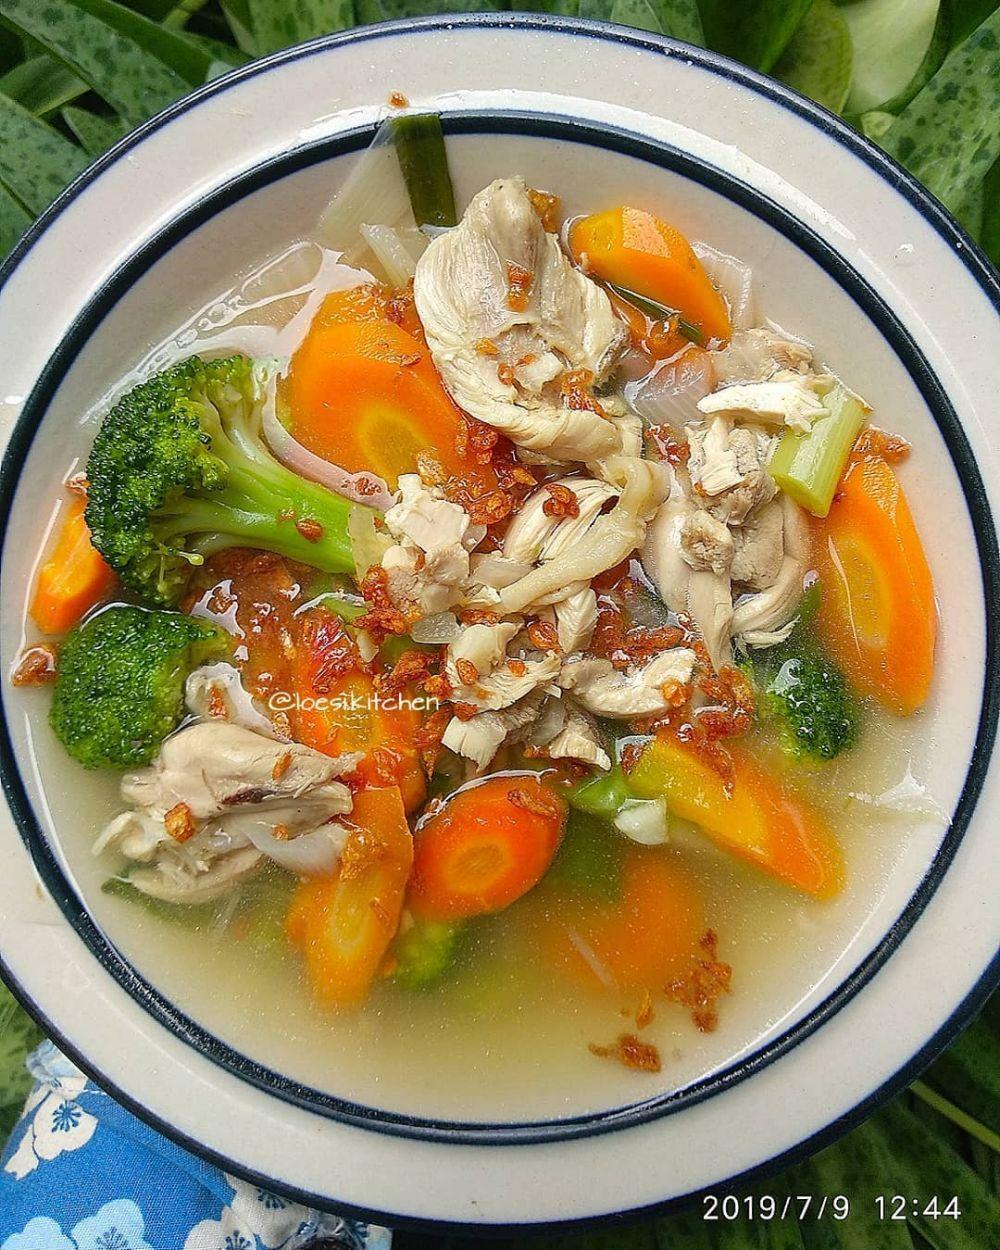 17 Resep Sop Rumahan Instagram Resep Makanan Sehat Resep Masakan Cina Resep Masakan